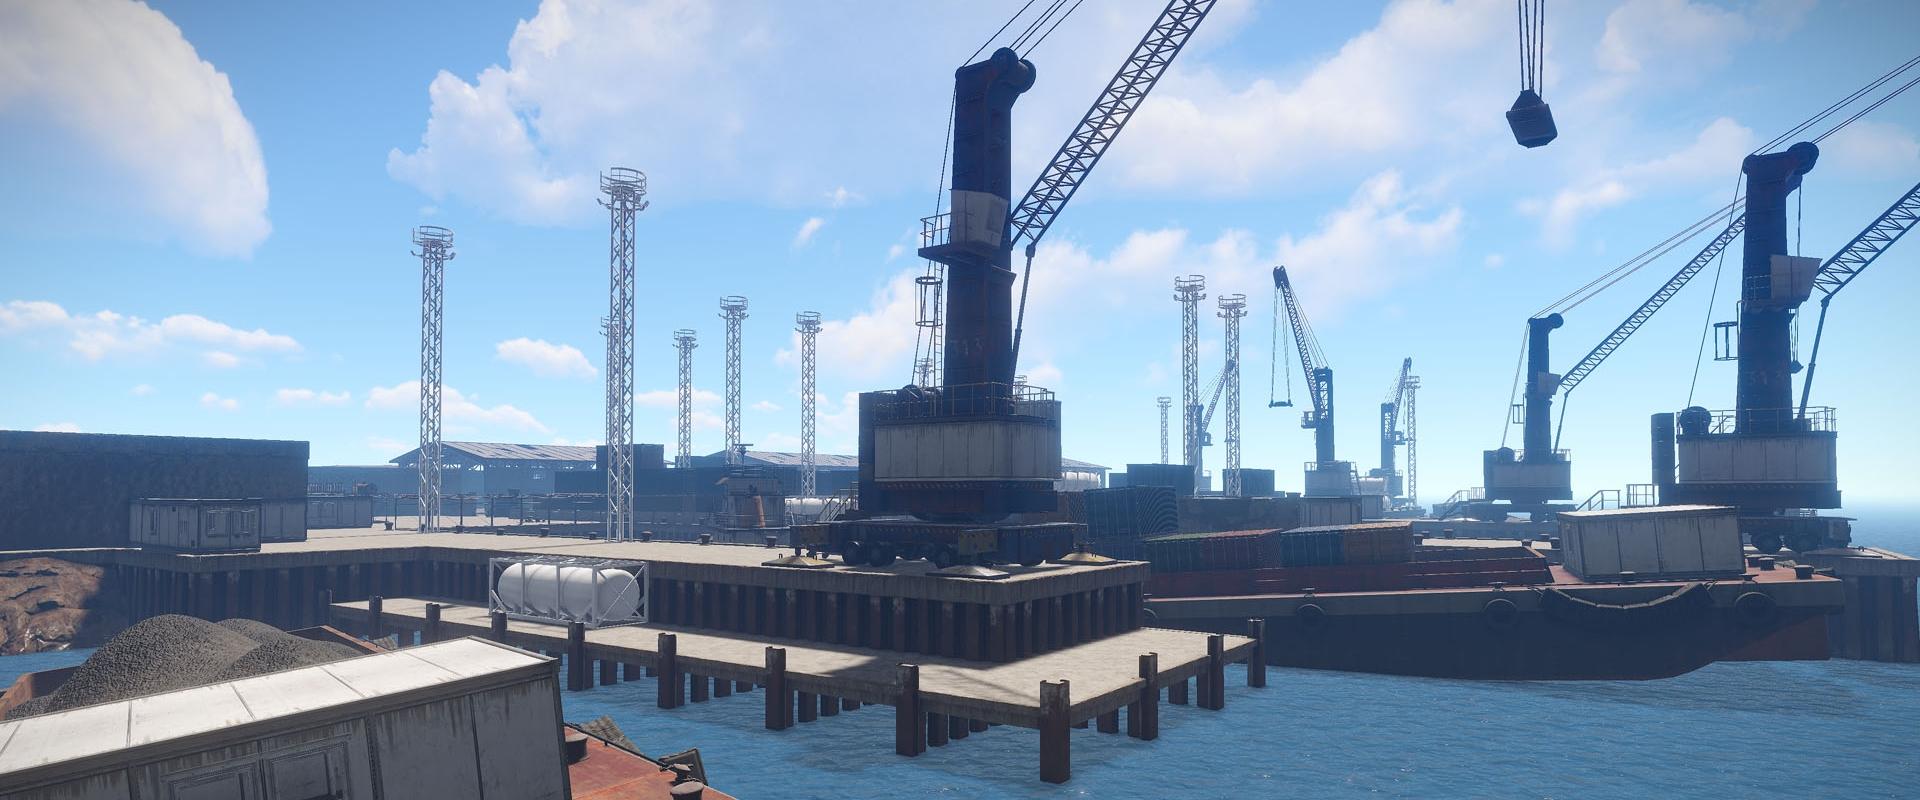 Harbors Incoming